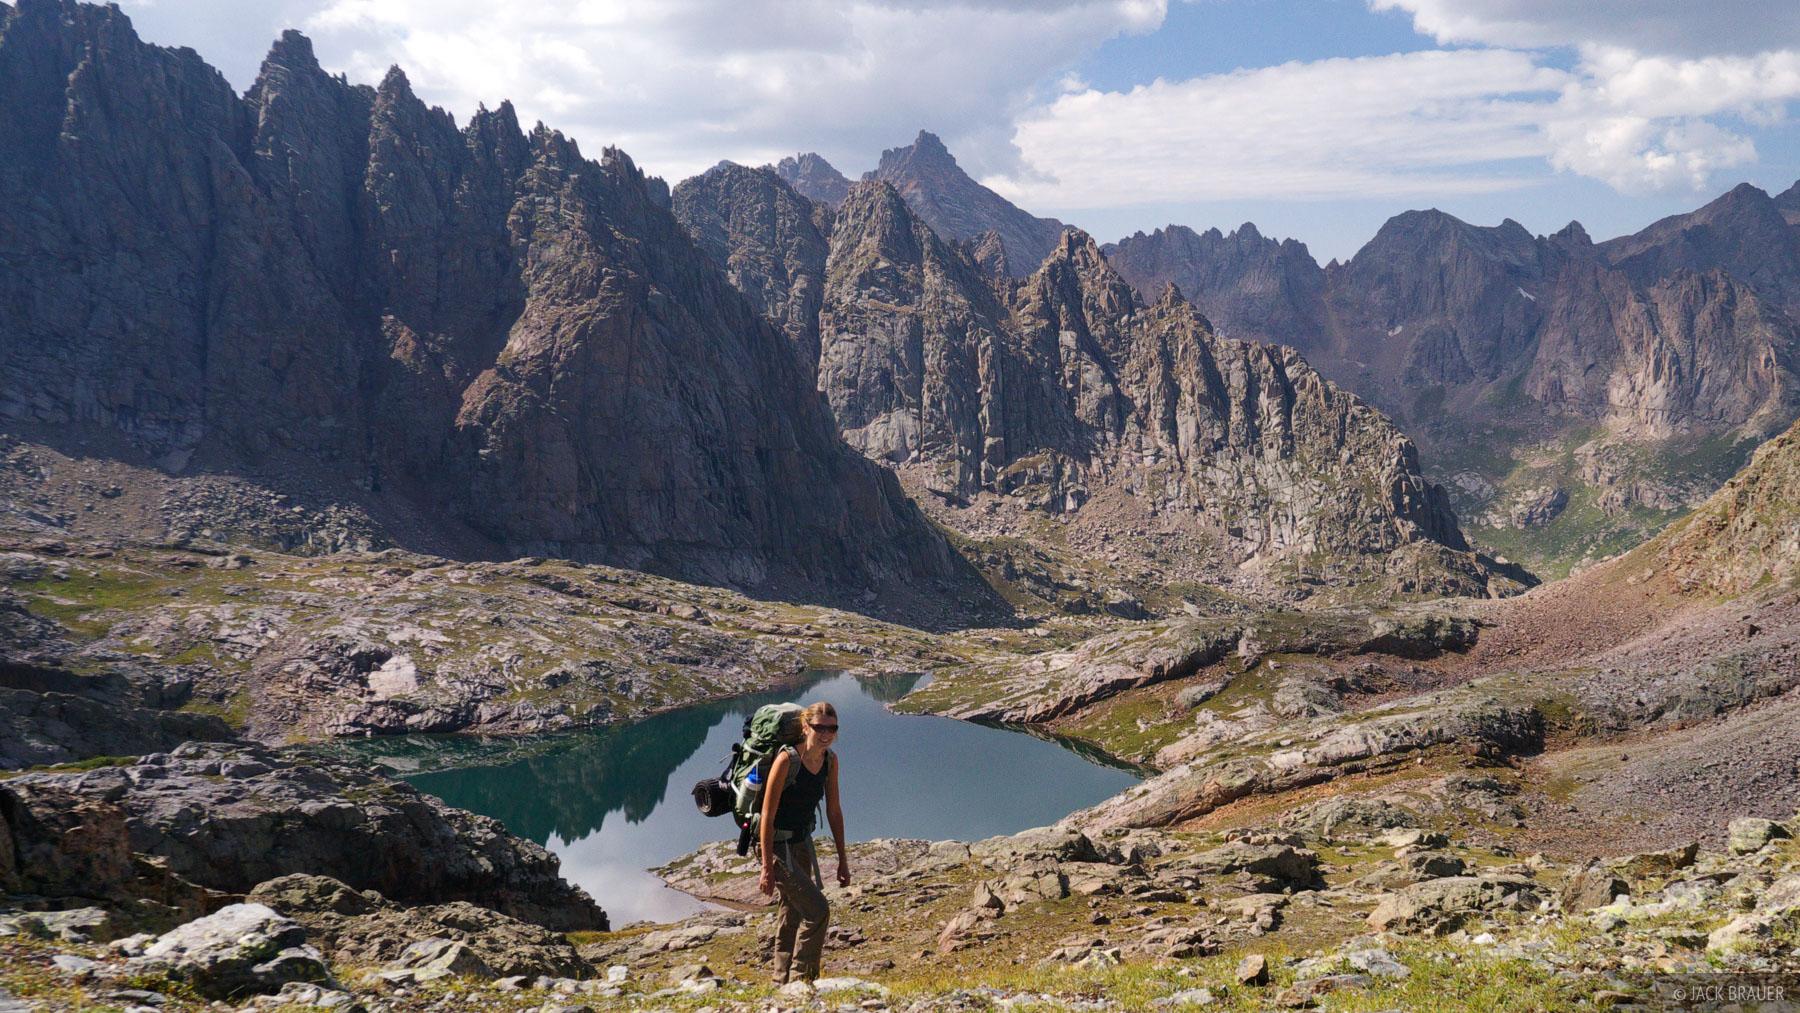 Needle Mountains, hiking, San Juan Mountains, Colorado, August, Weminuche Wilderness, photo